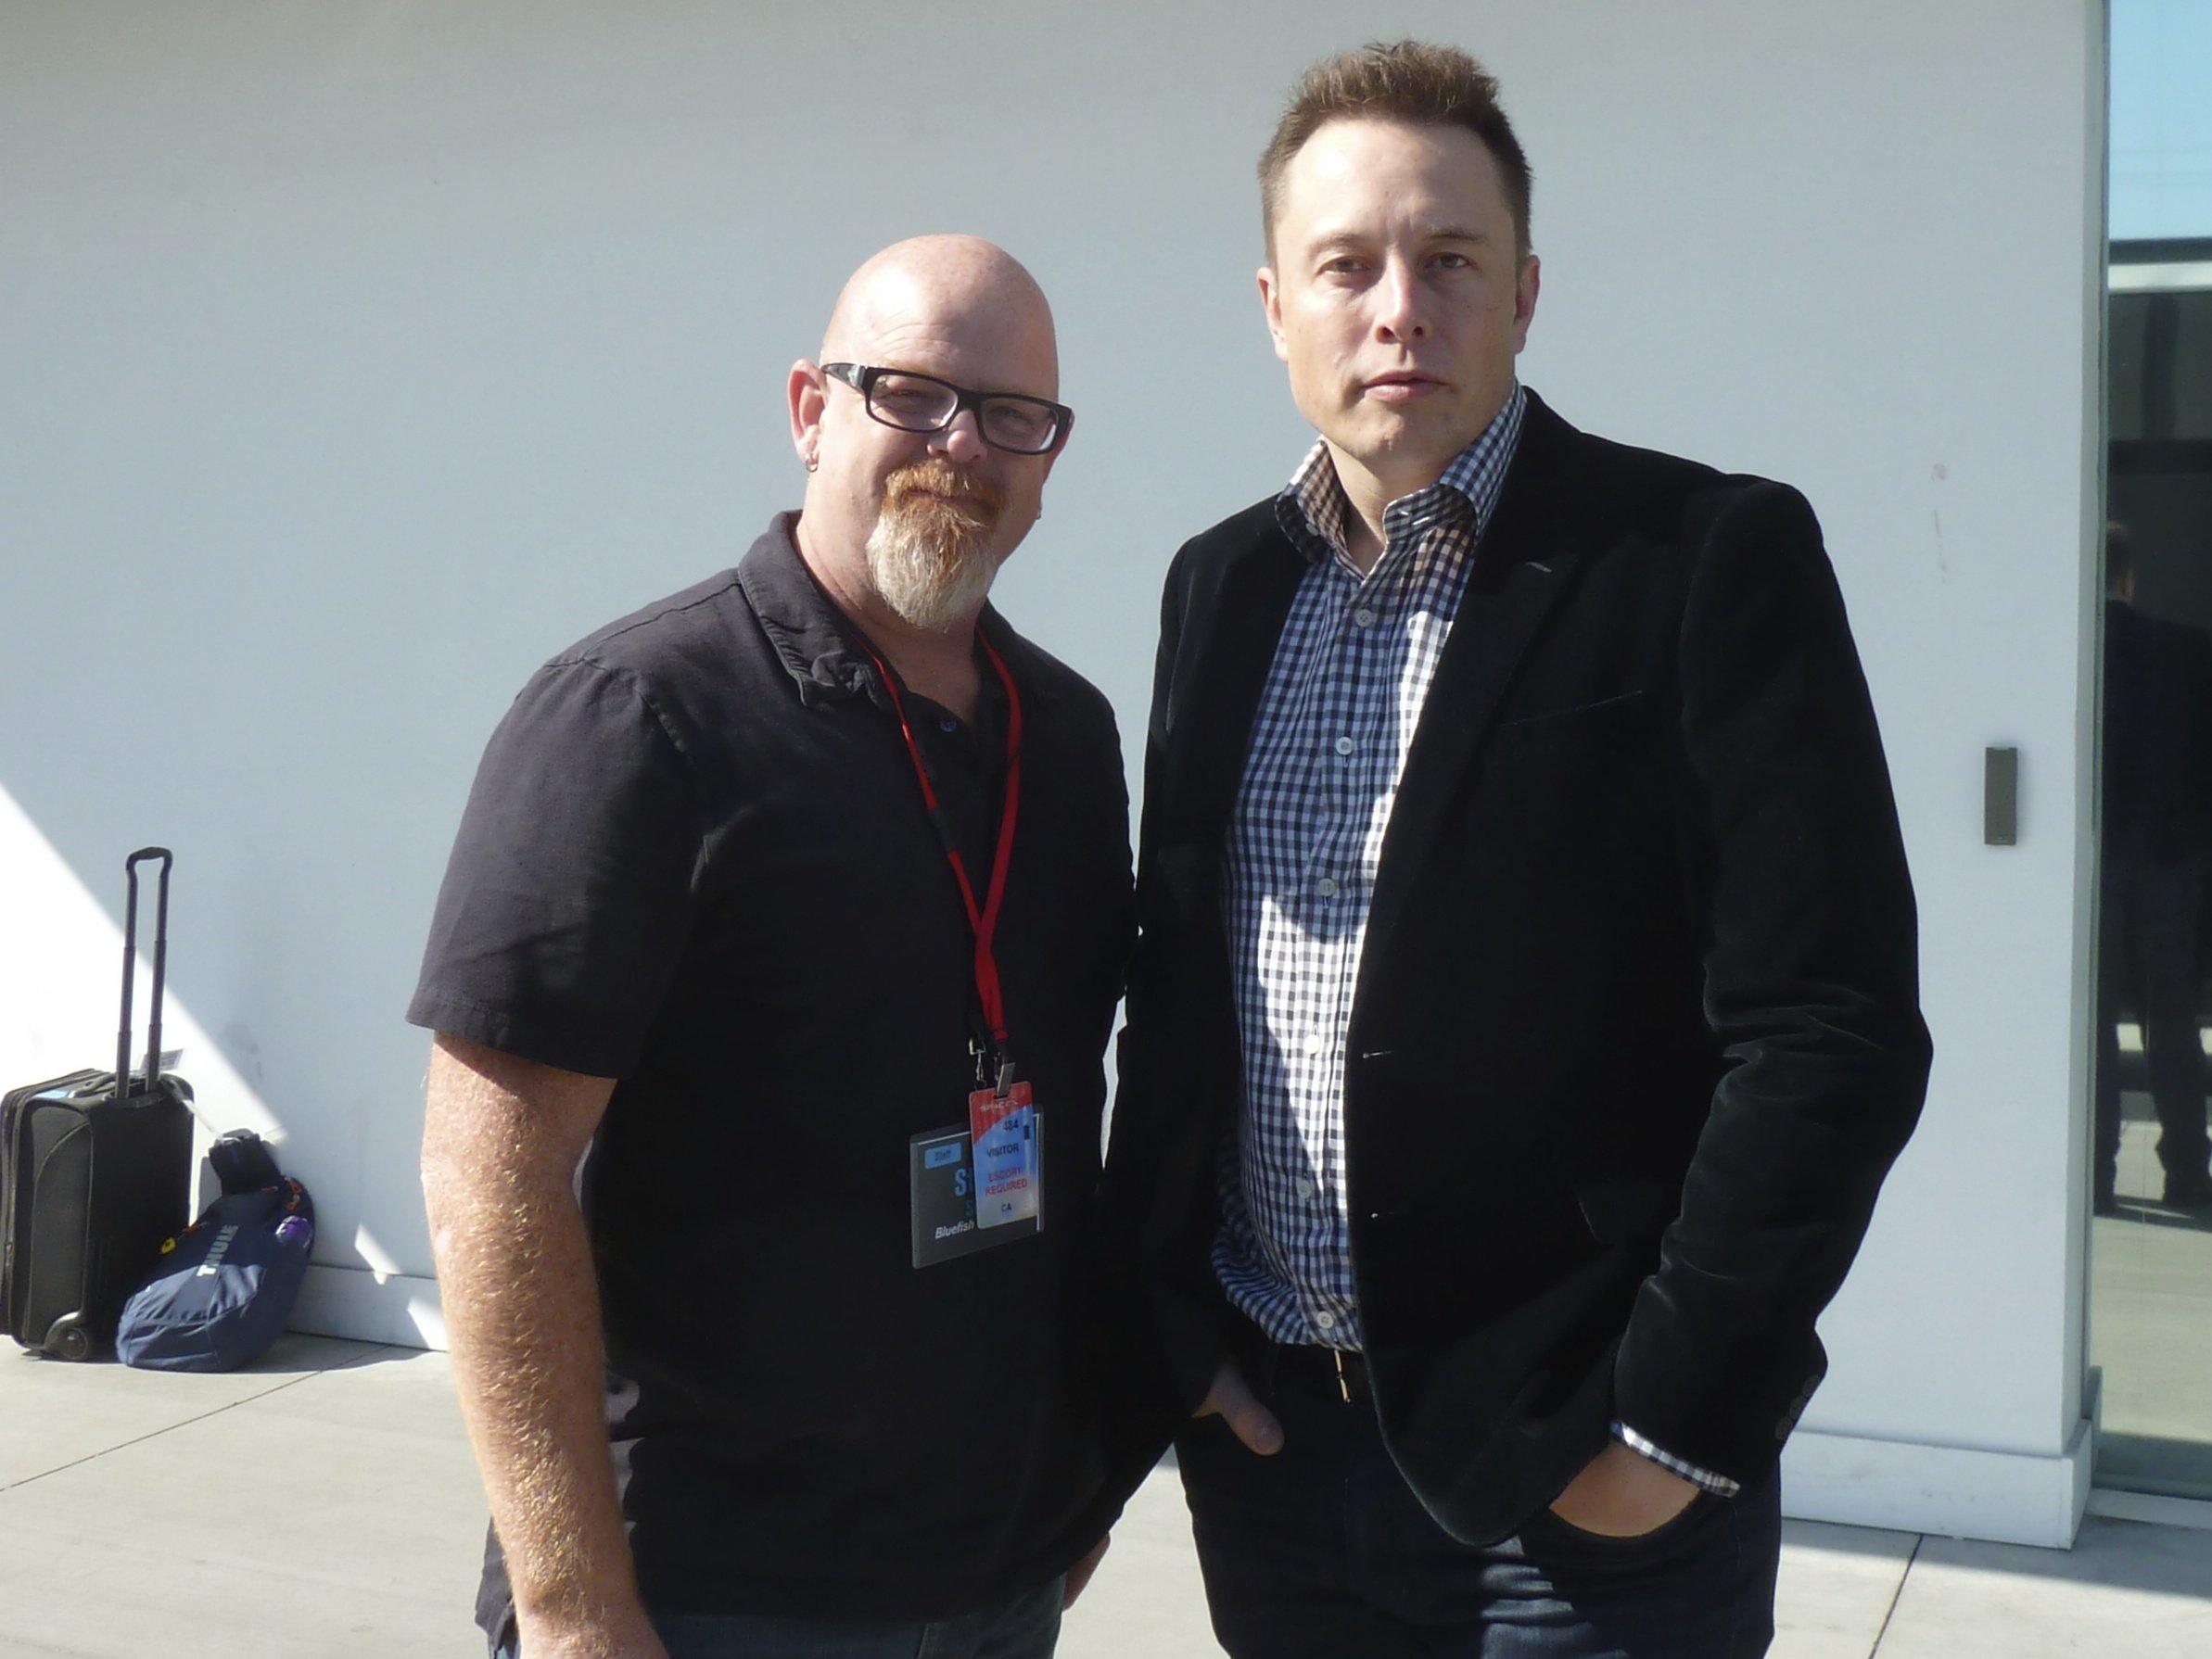 With Elon MUSK